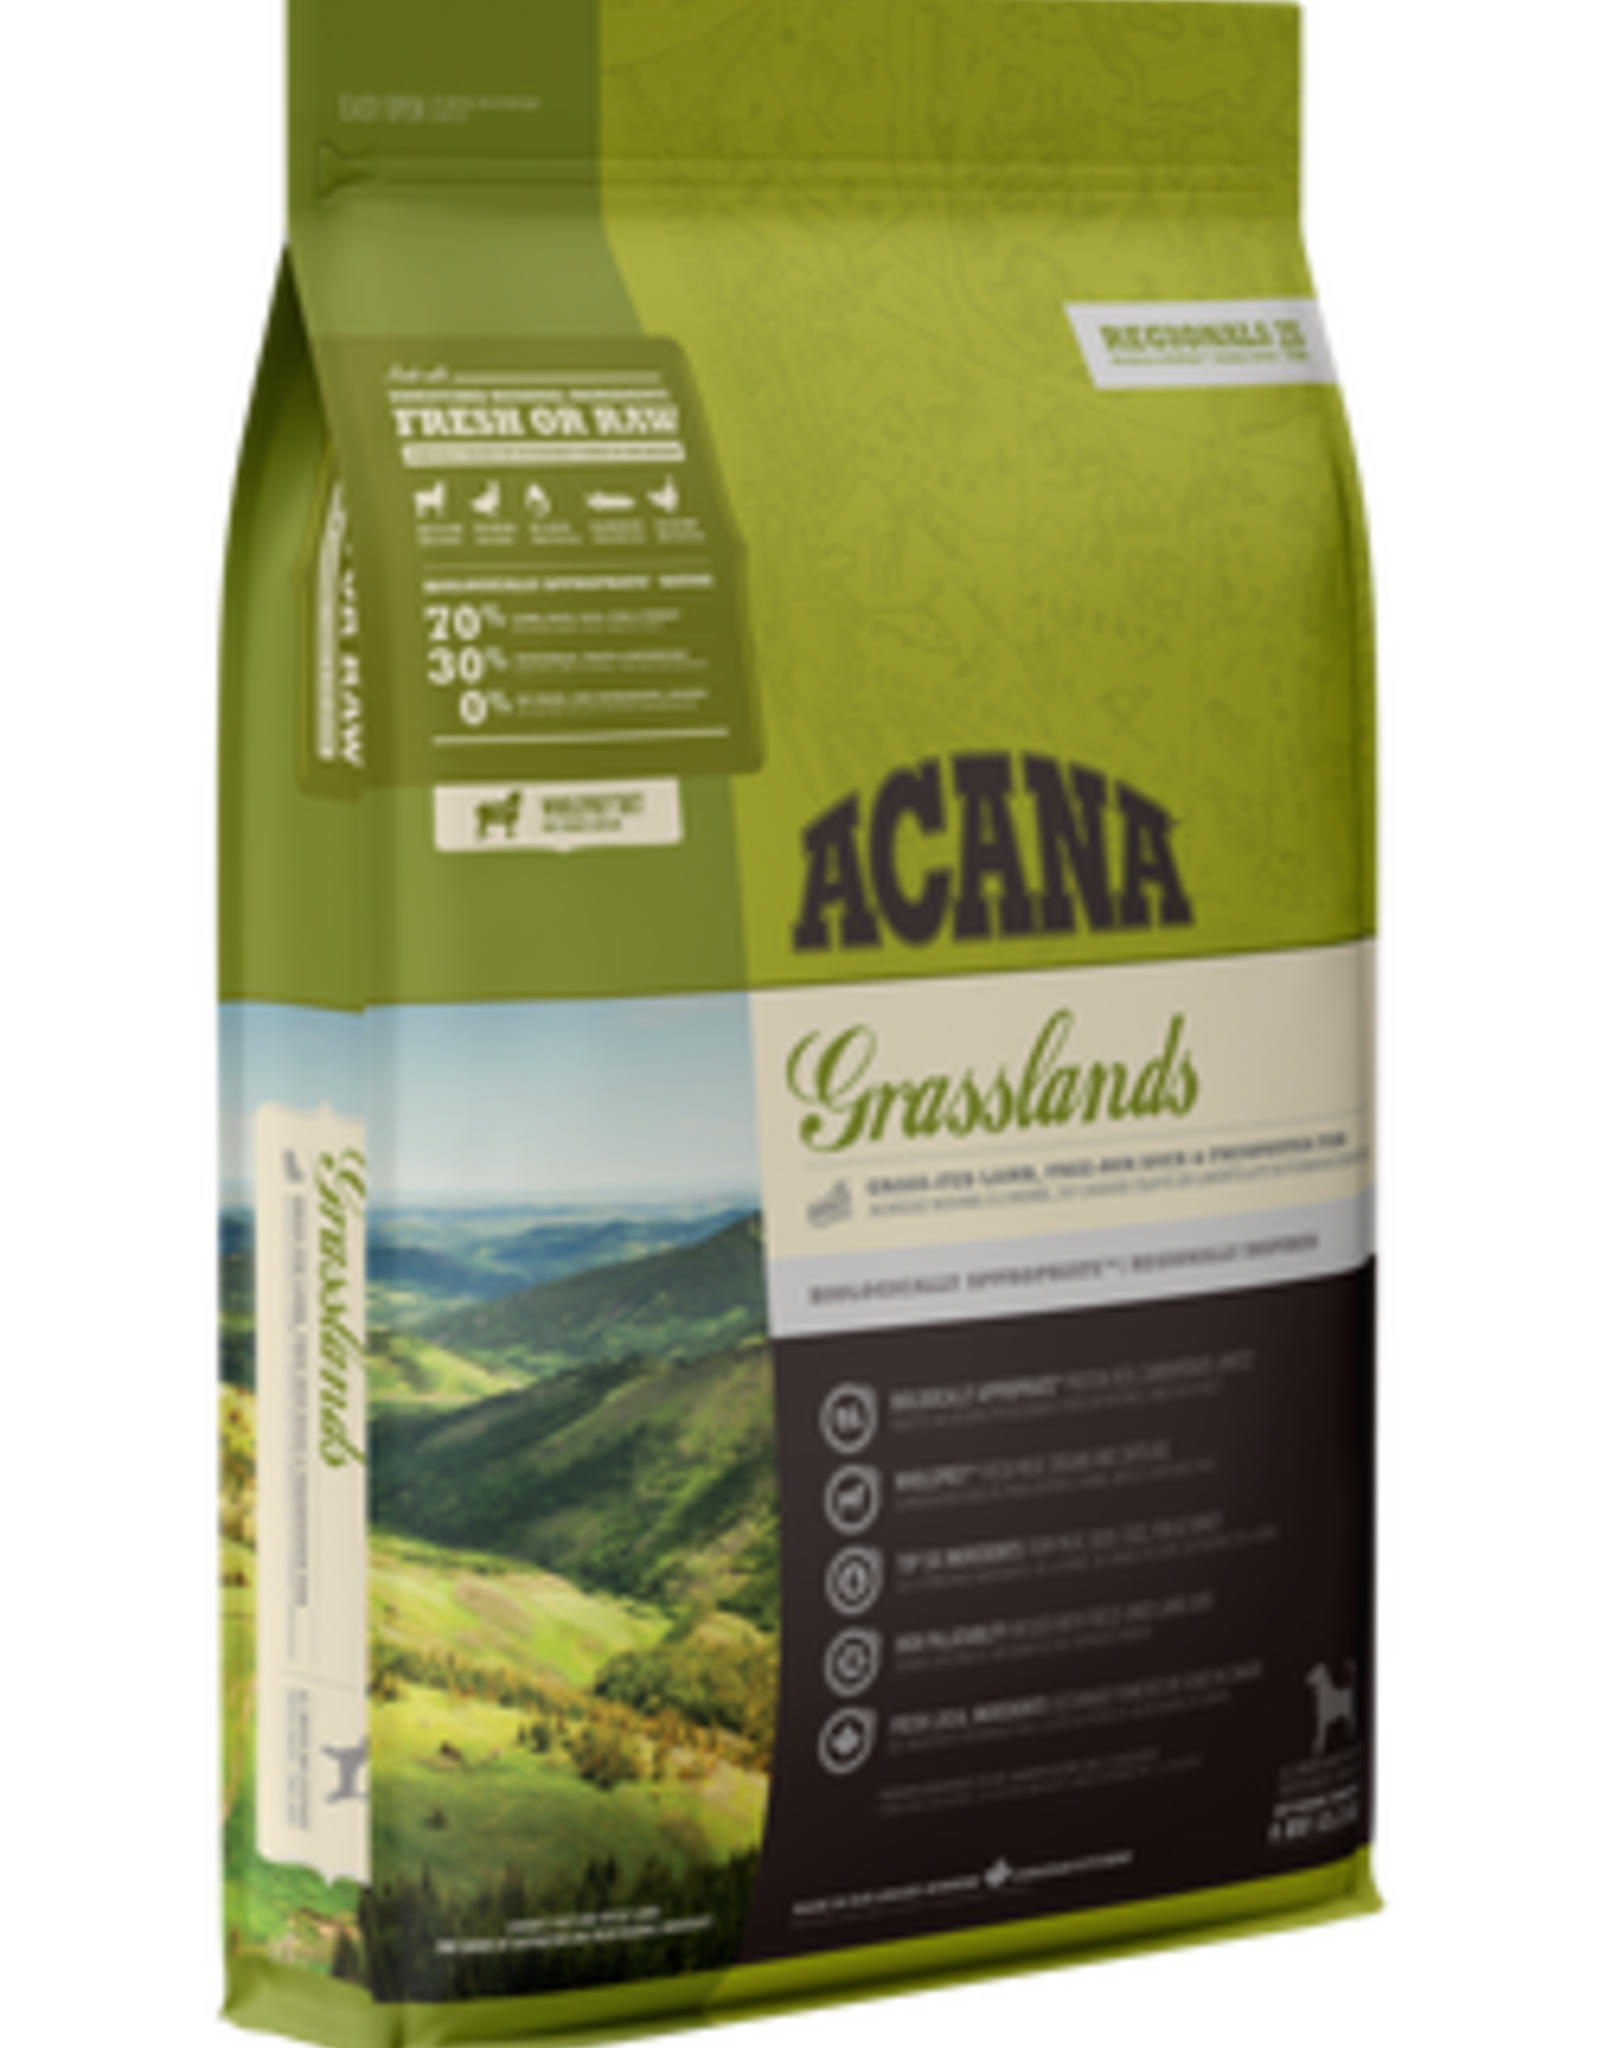 Acana Acana Grasslands - Lamb, Duck & Fish 340g